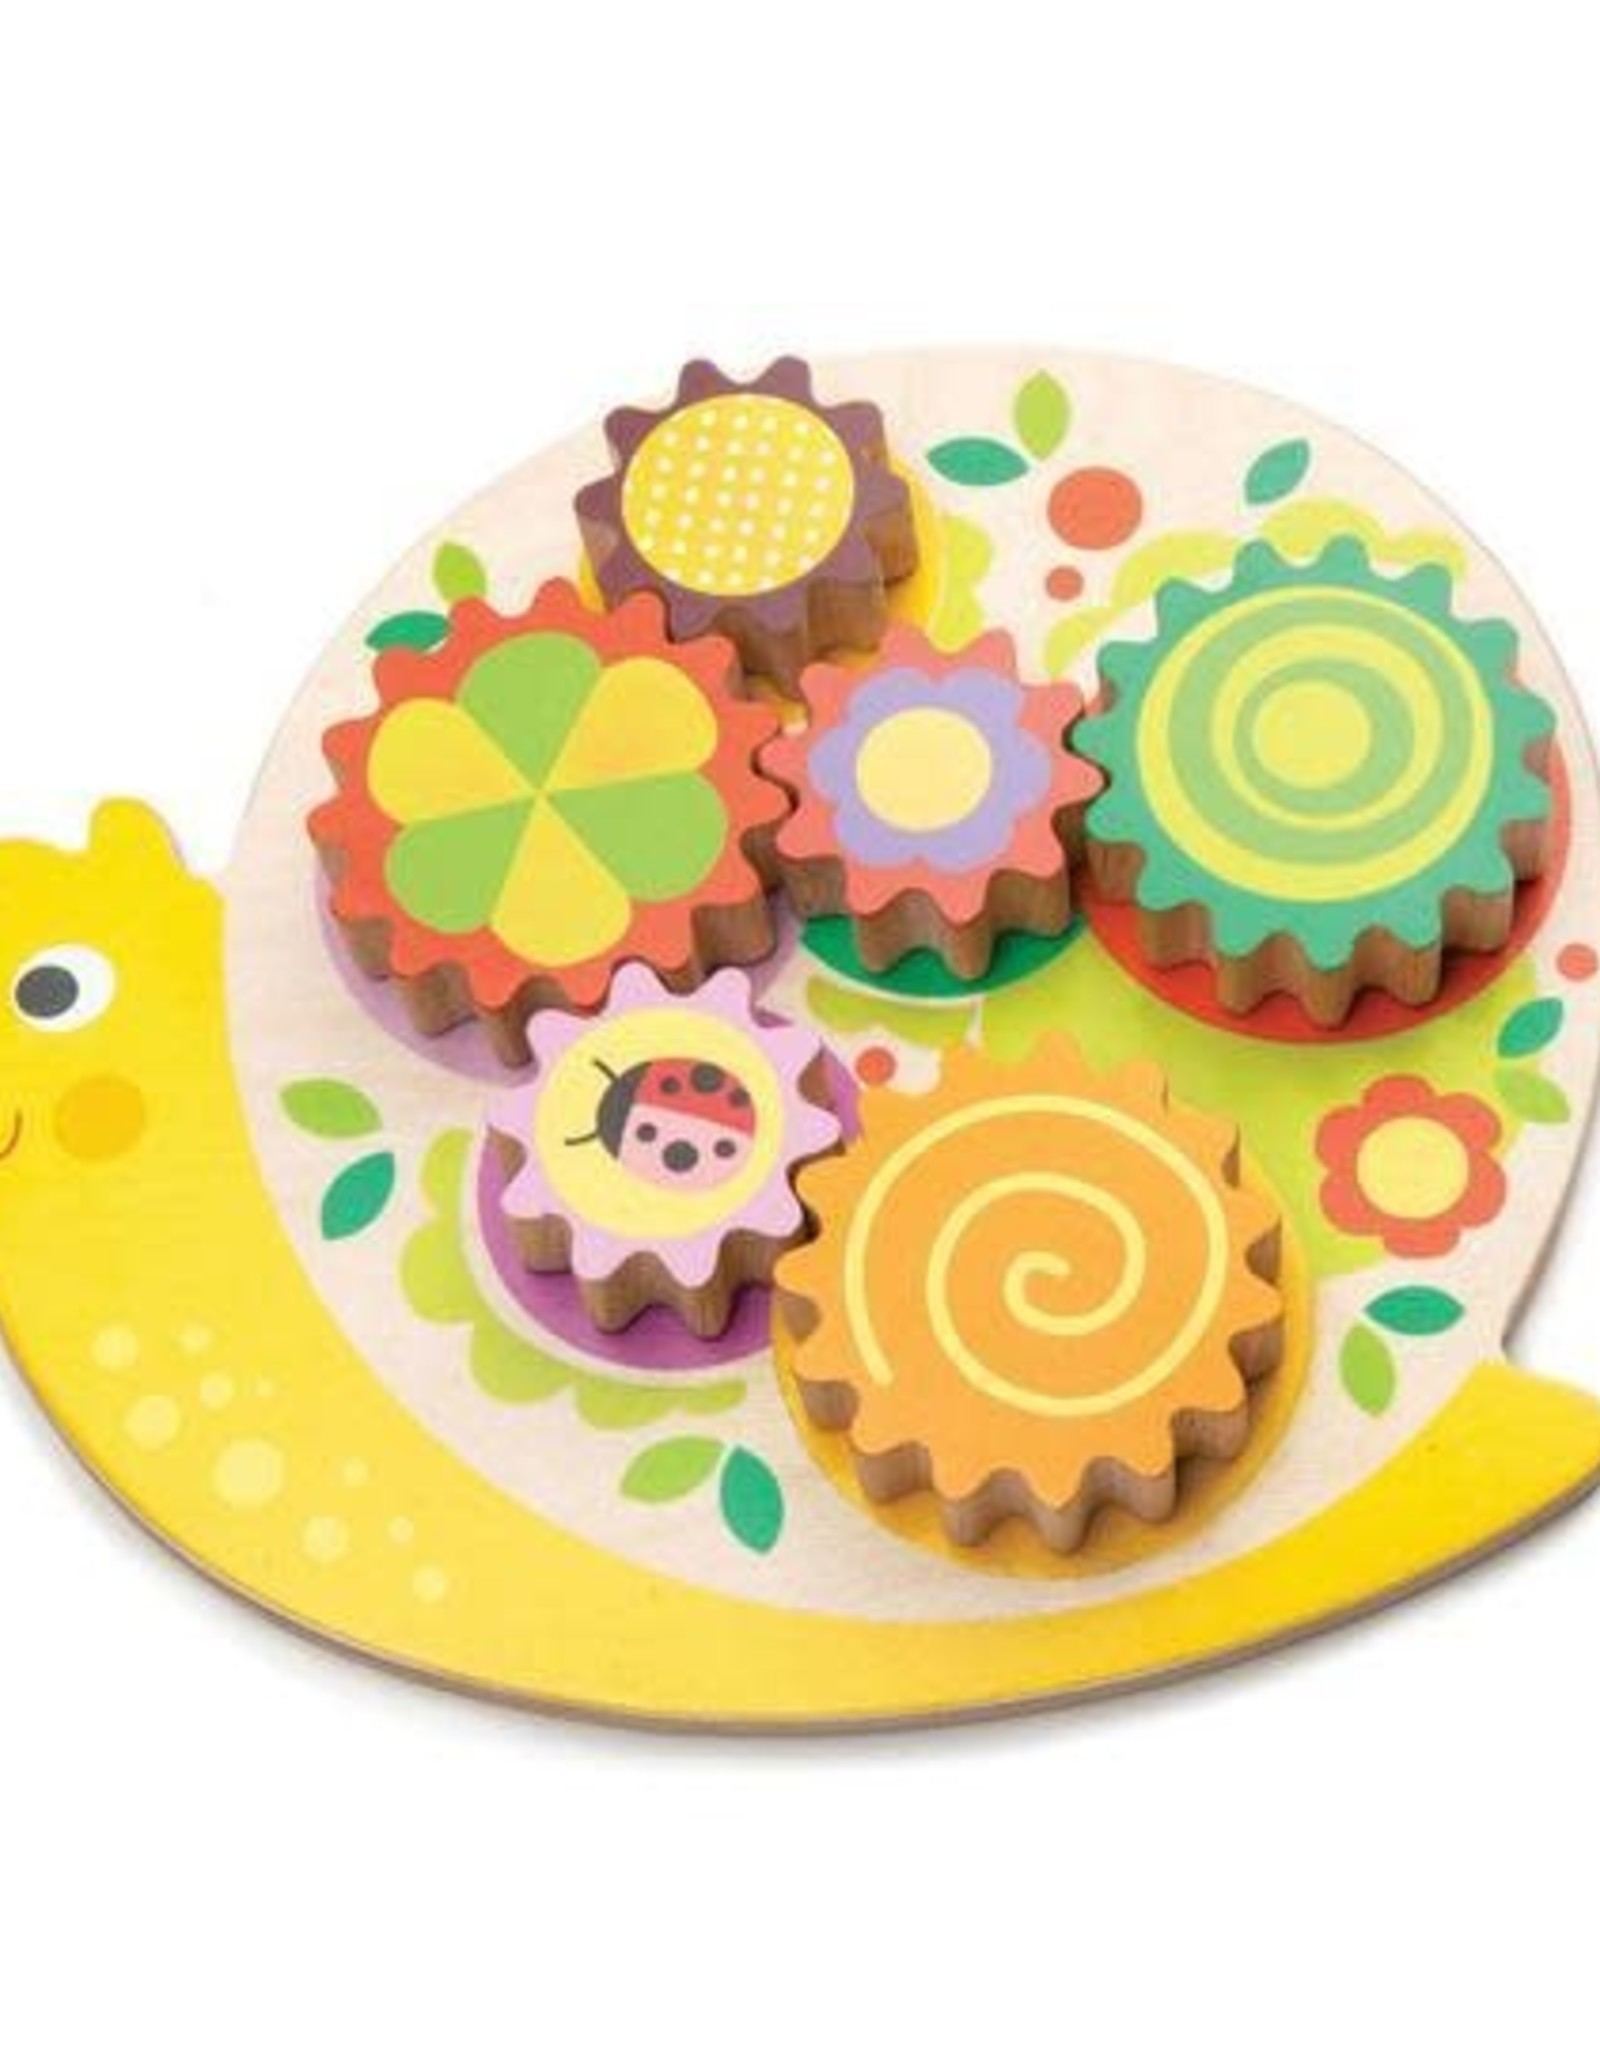 Tender Leaf Toys Snail Whirls